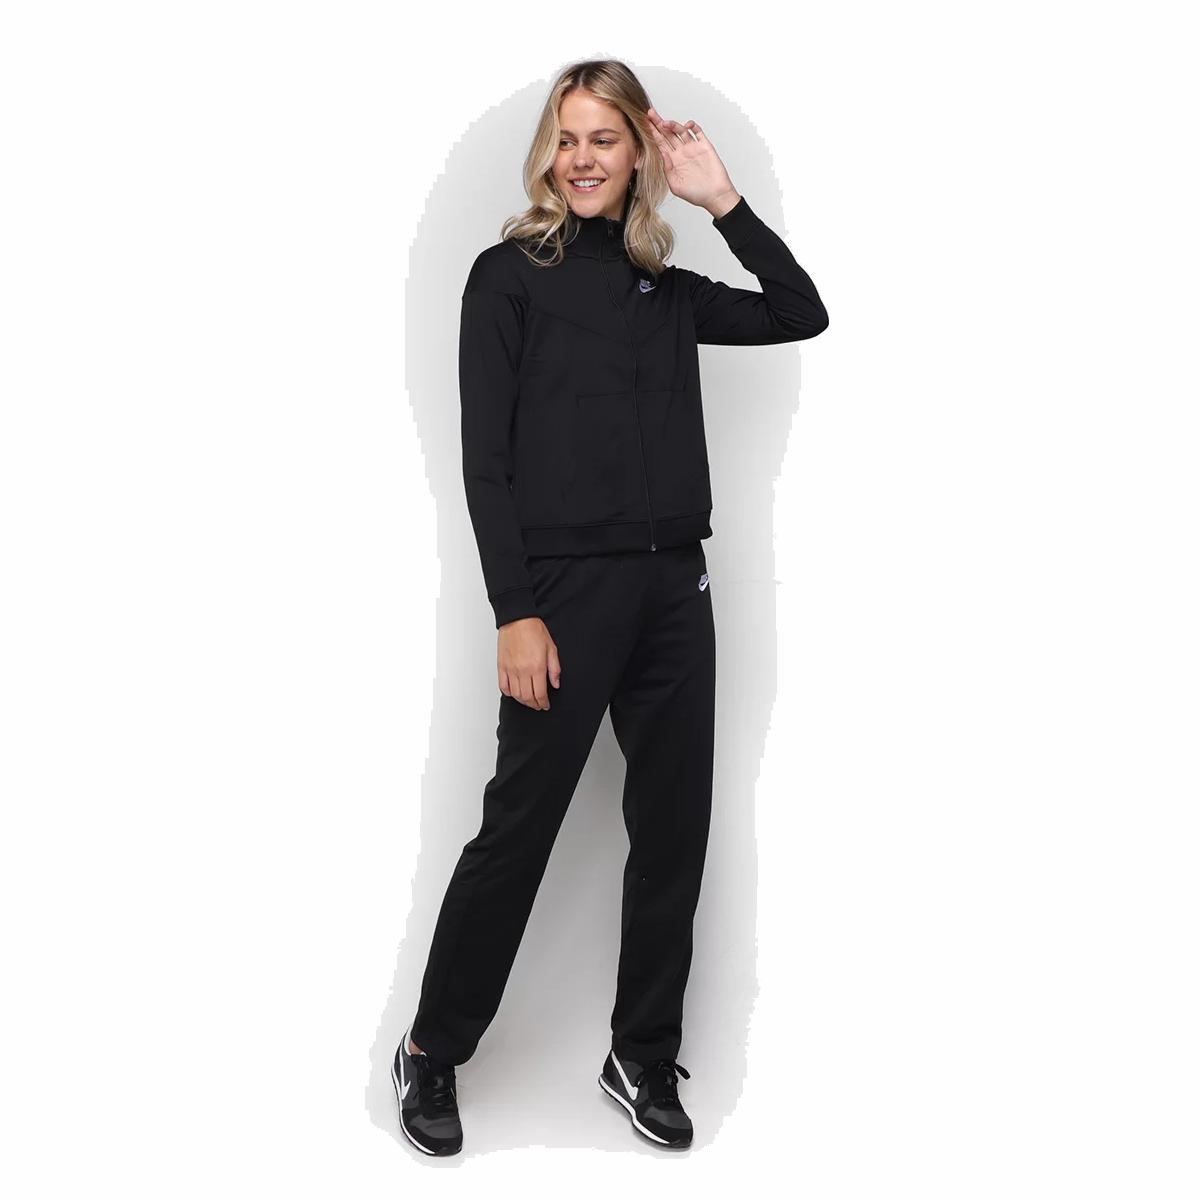 Agasalho Nike Sportswear Feminino Wmns Nsw Trk Suit Pk